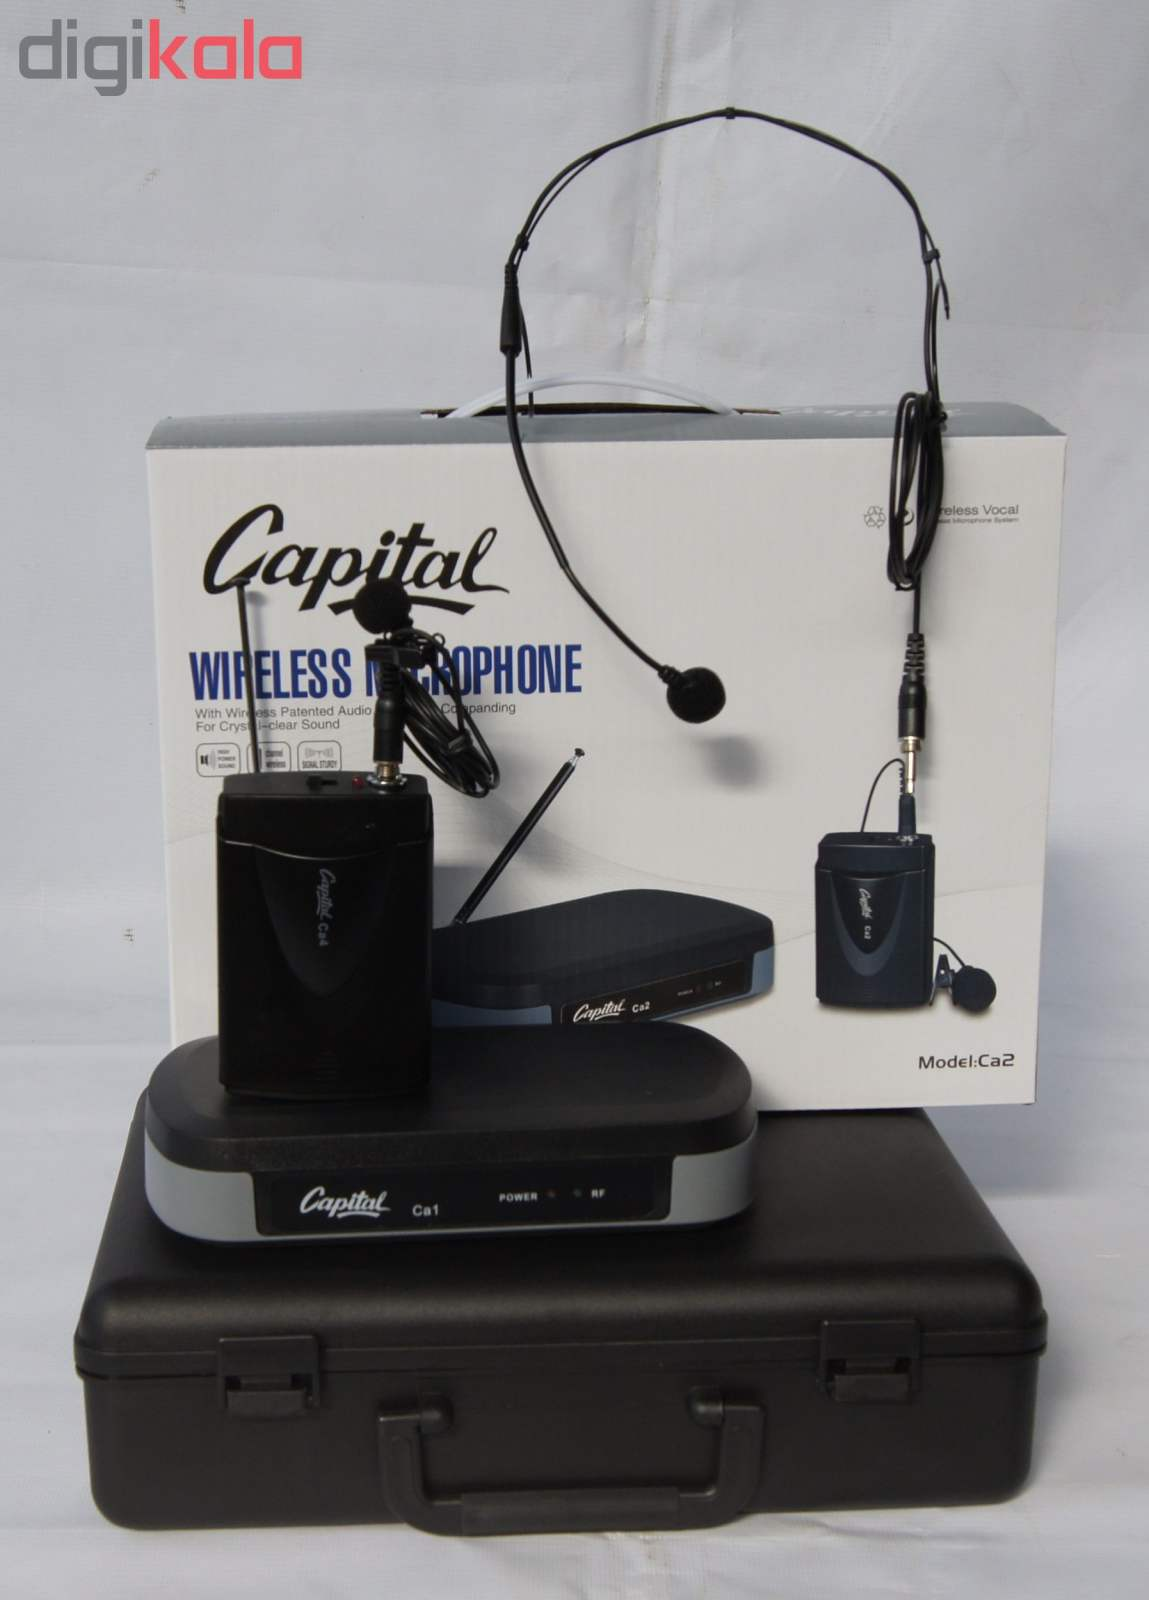 ست میکروفن بی سیم کاپیتال مدل Ca2 main 1 3